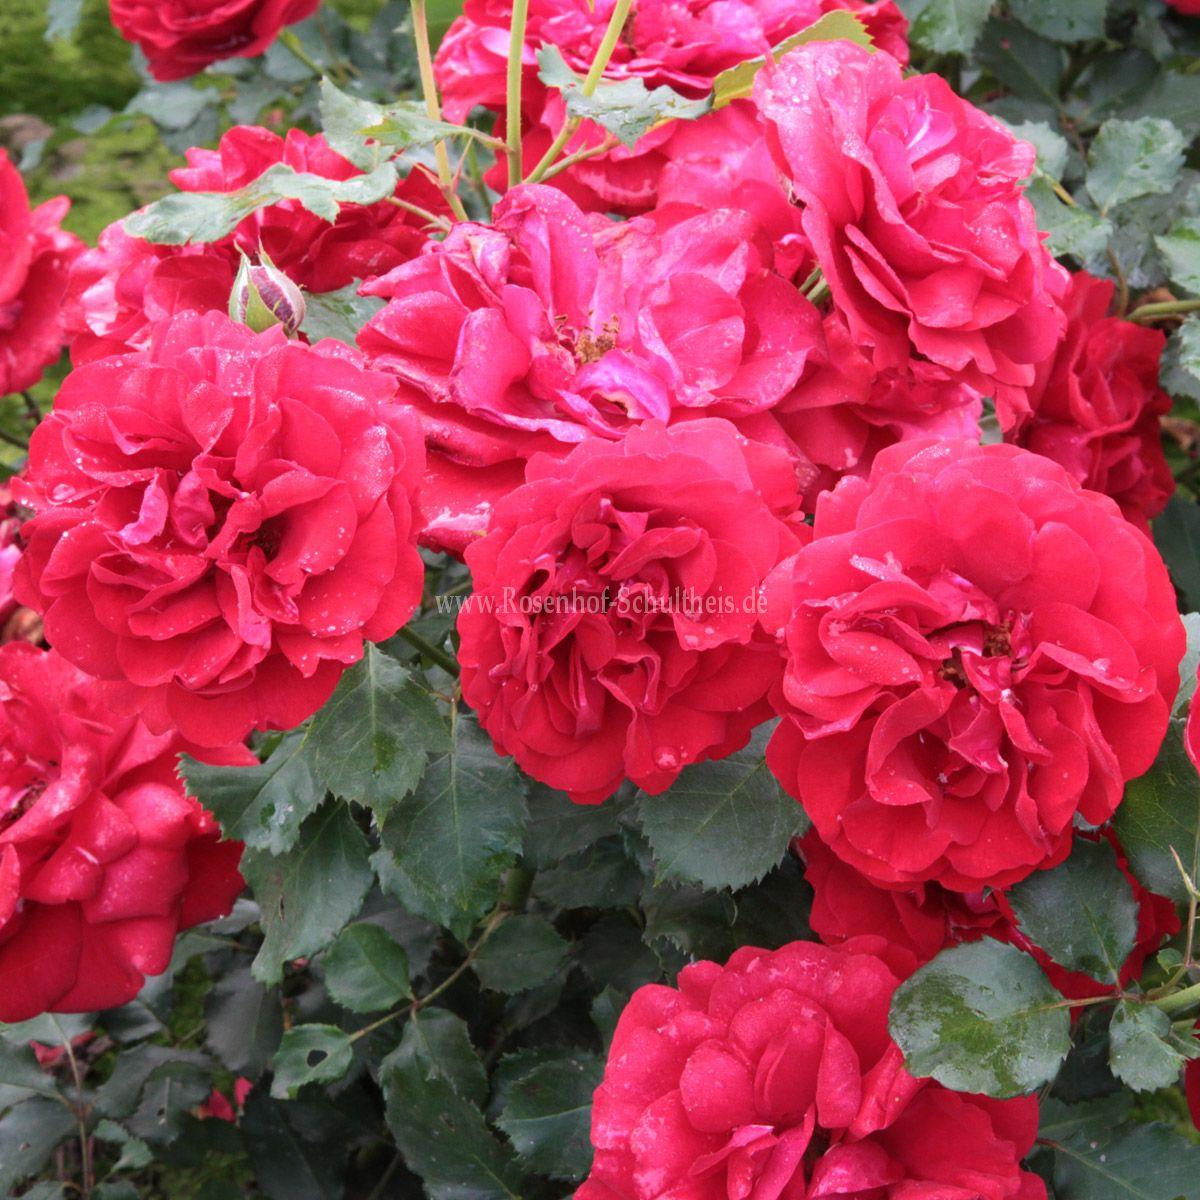 g rtnerfreude rosen online kaufen im rosenhof schultheis. Black Bedroom Furniture Sets. Home Design Ideas